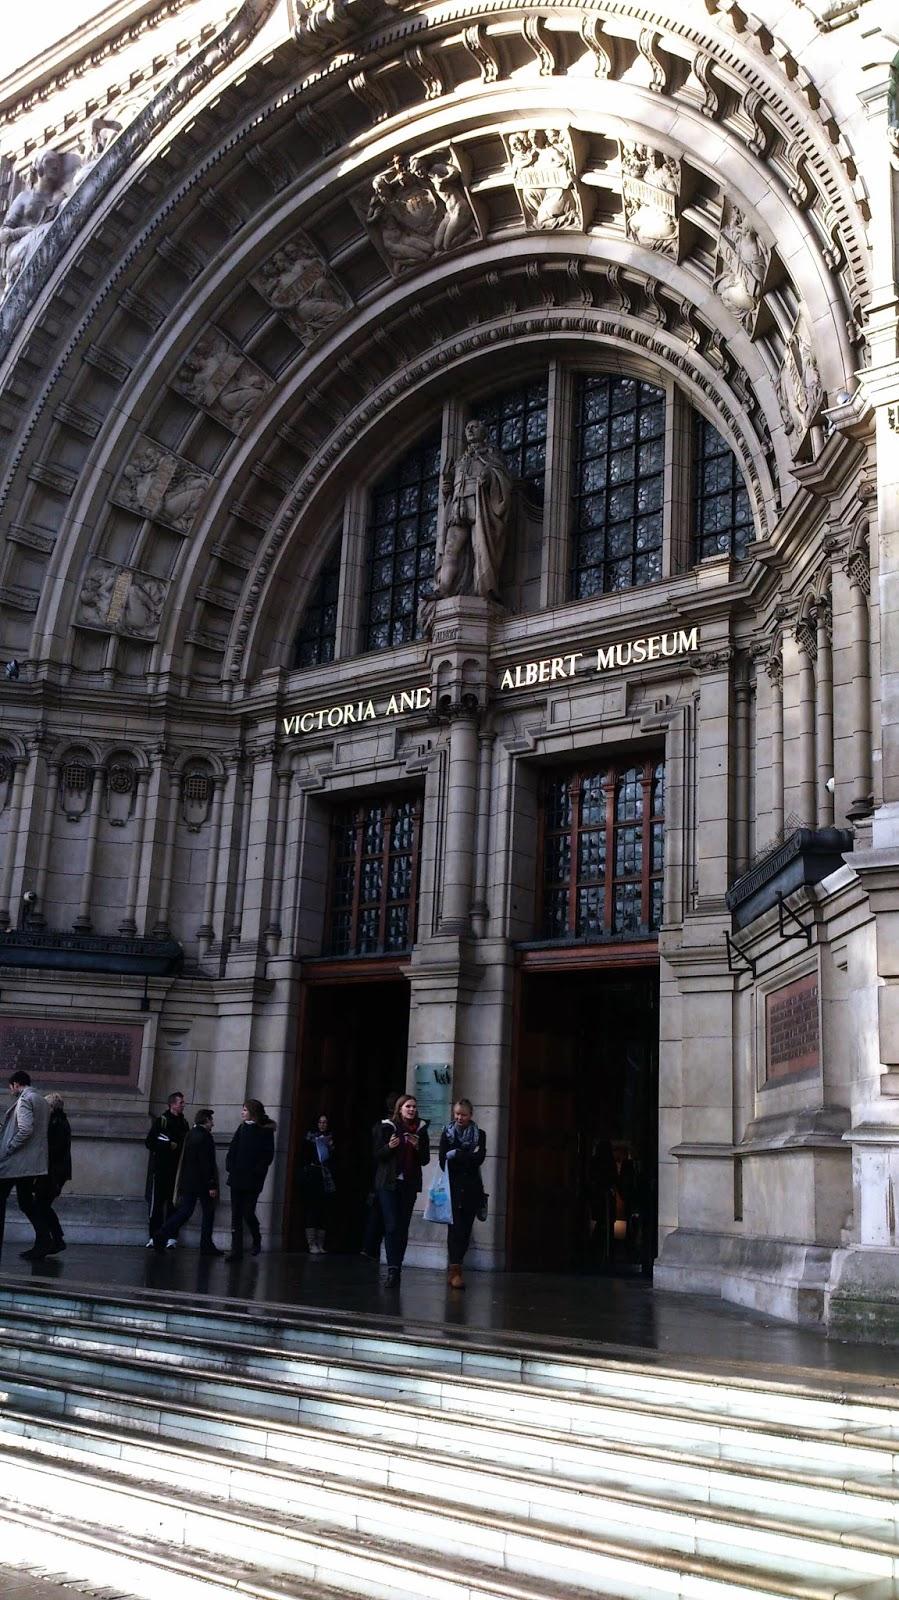 Deborah o 39 hare victoria and albert museum london for Victoria and albert museum london